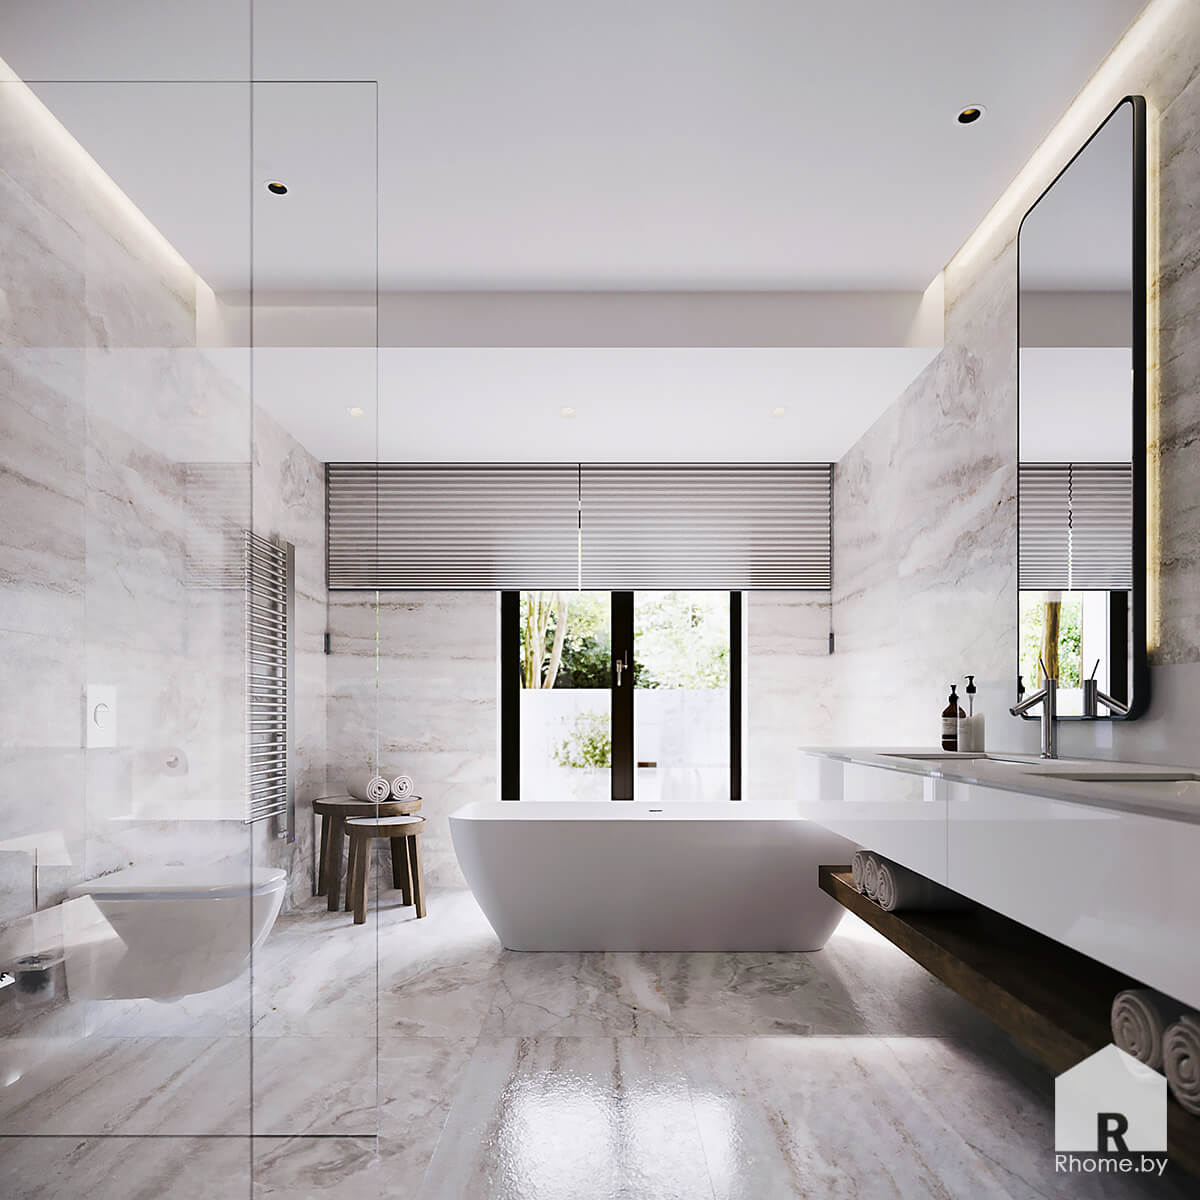 Дизайн интерьера ванной комнаты | Дизайн студия – Rhome.by